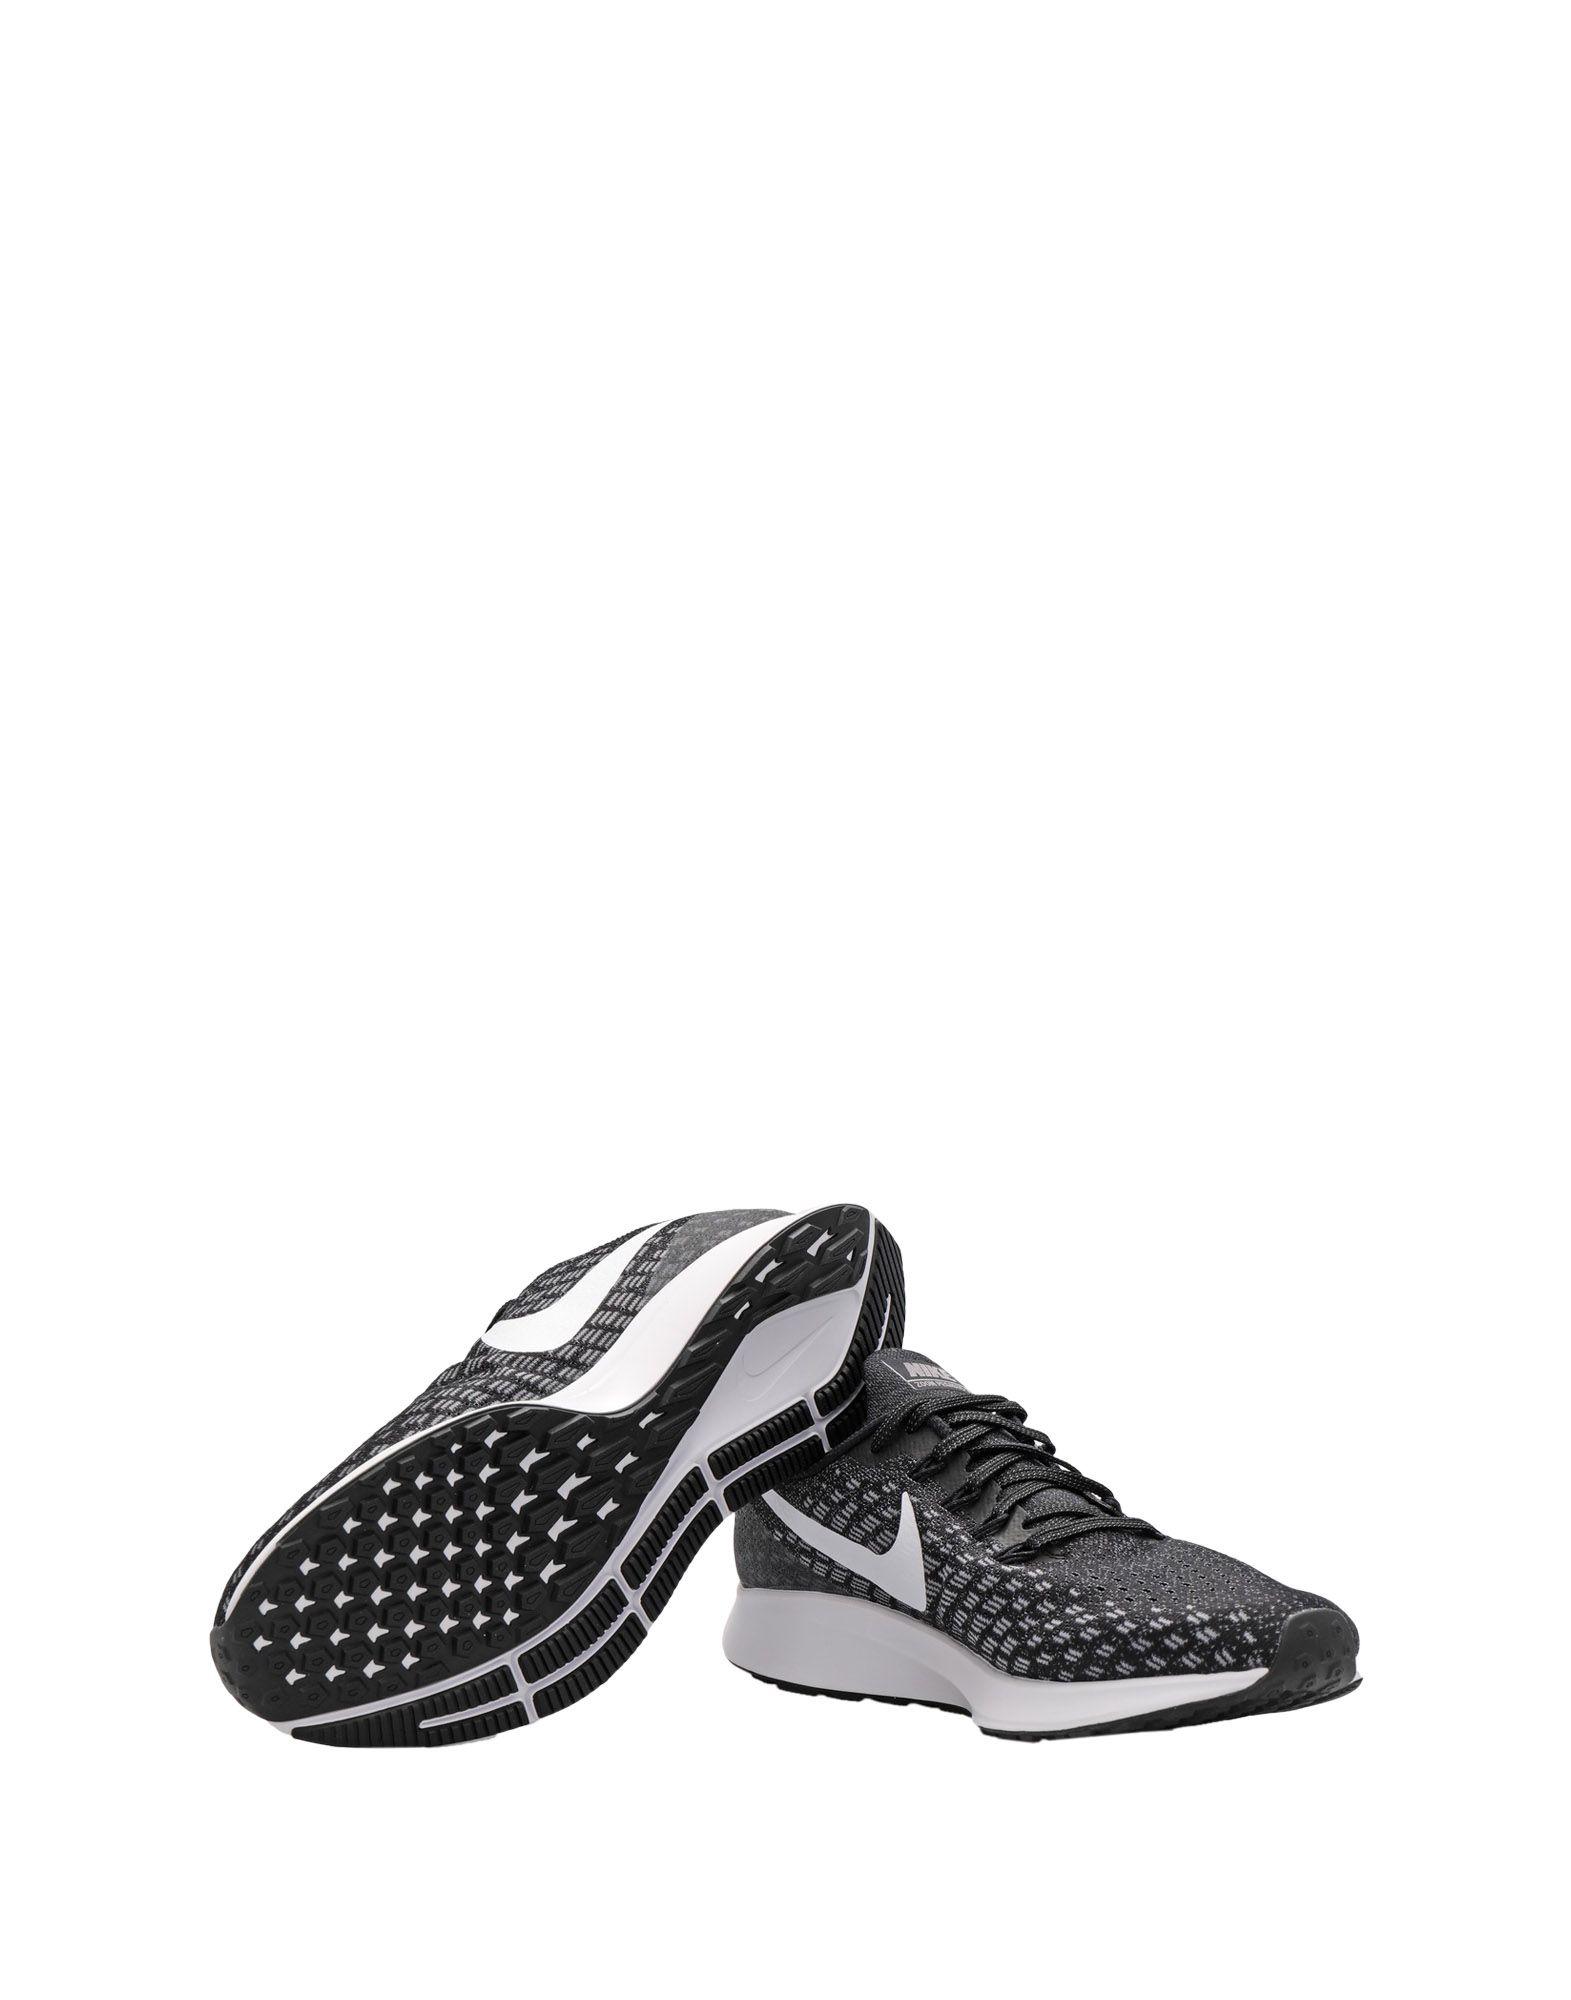 Nike   Air Zoom Pegasus 35   11553879NC e3558c